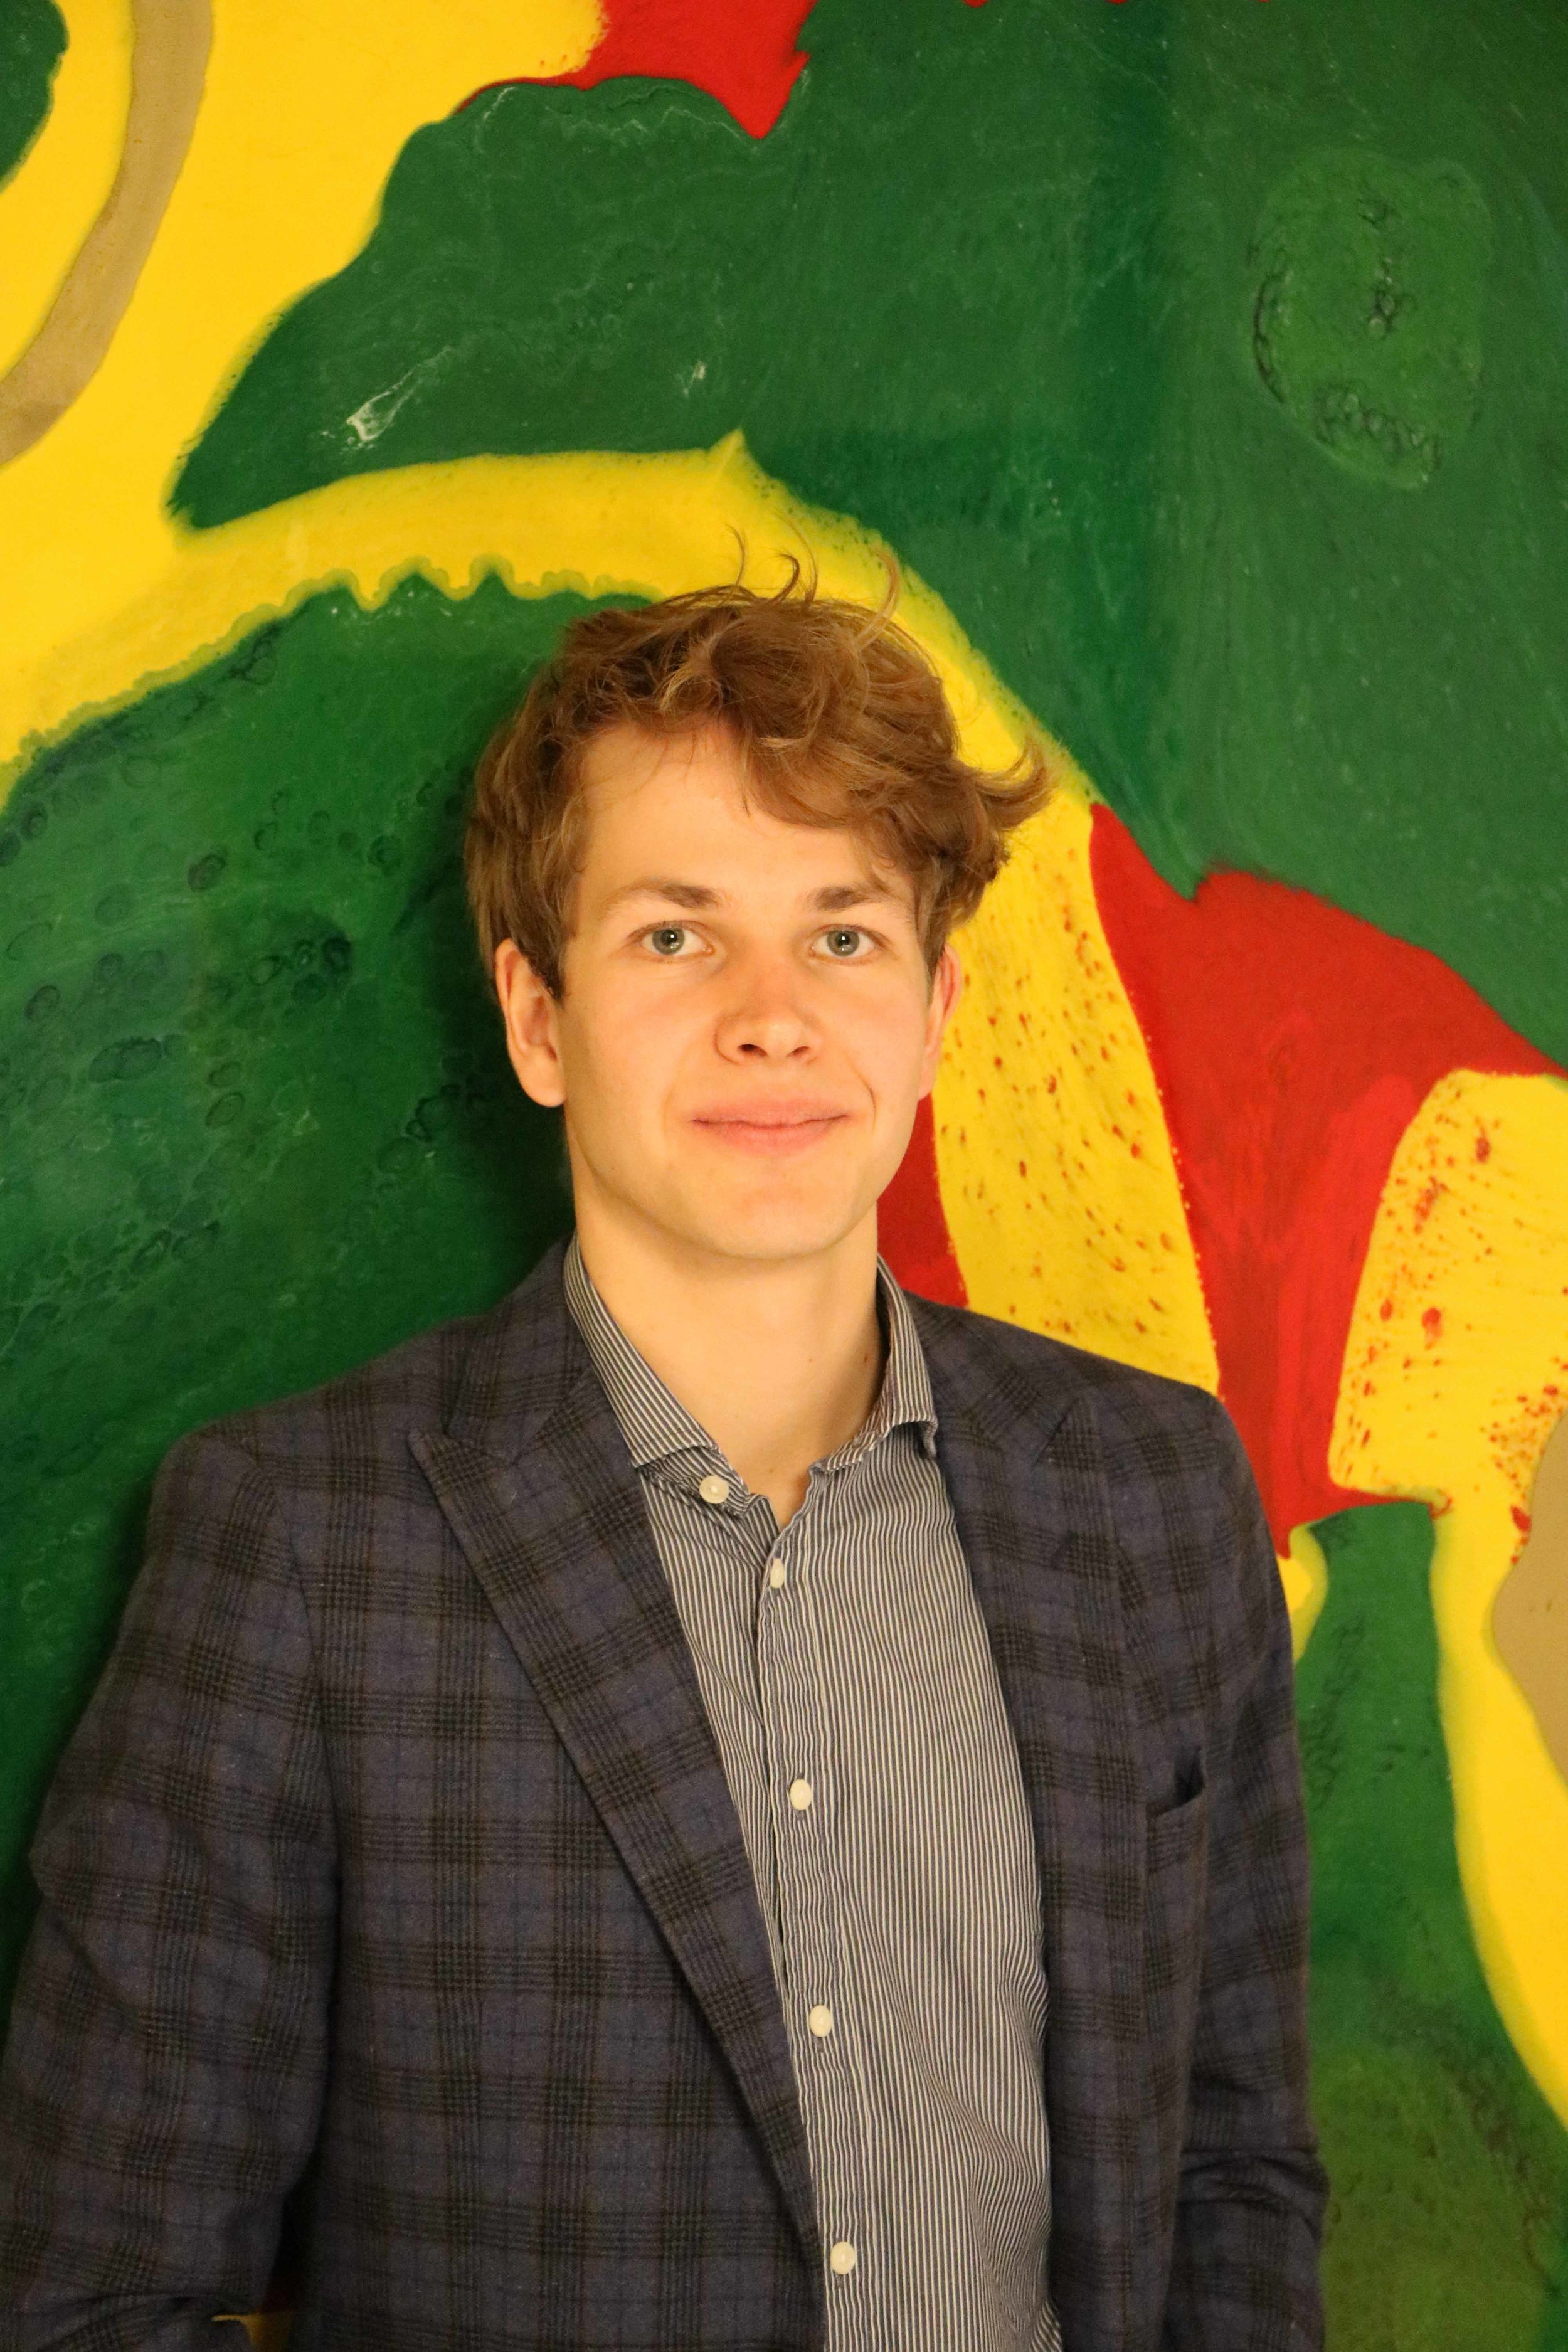 Mark van der Woude Kulturelles Erbe und Landschaftsmanagement